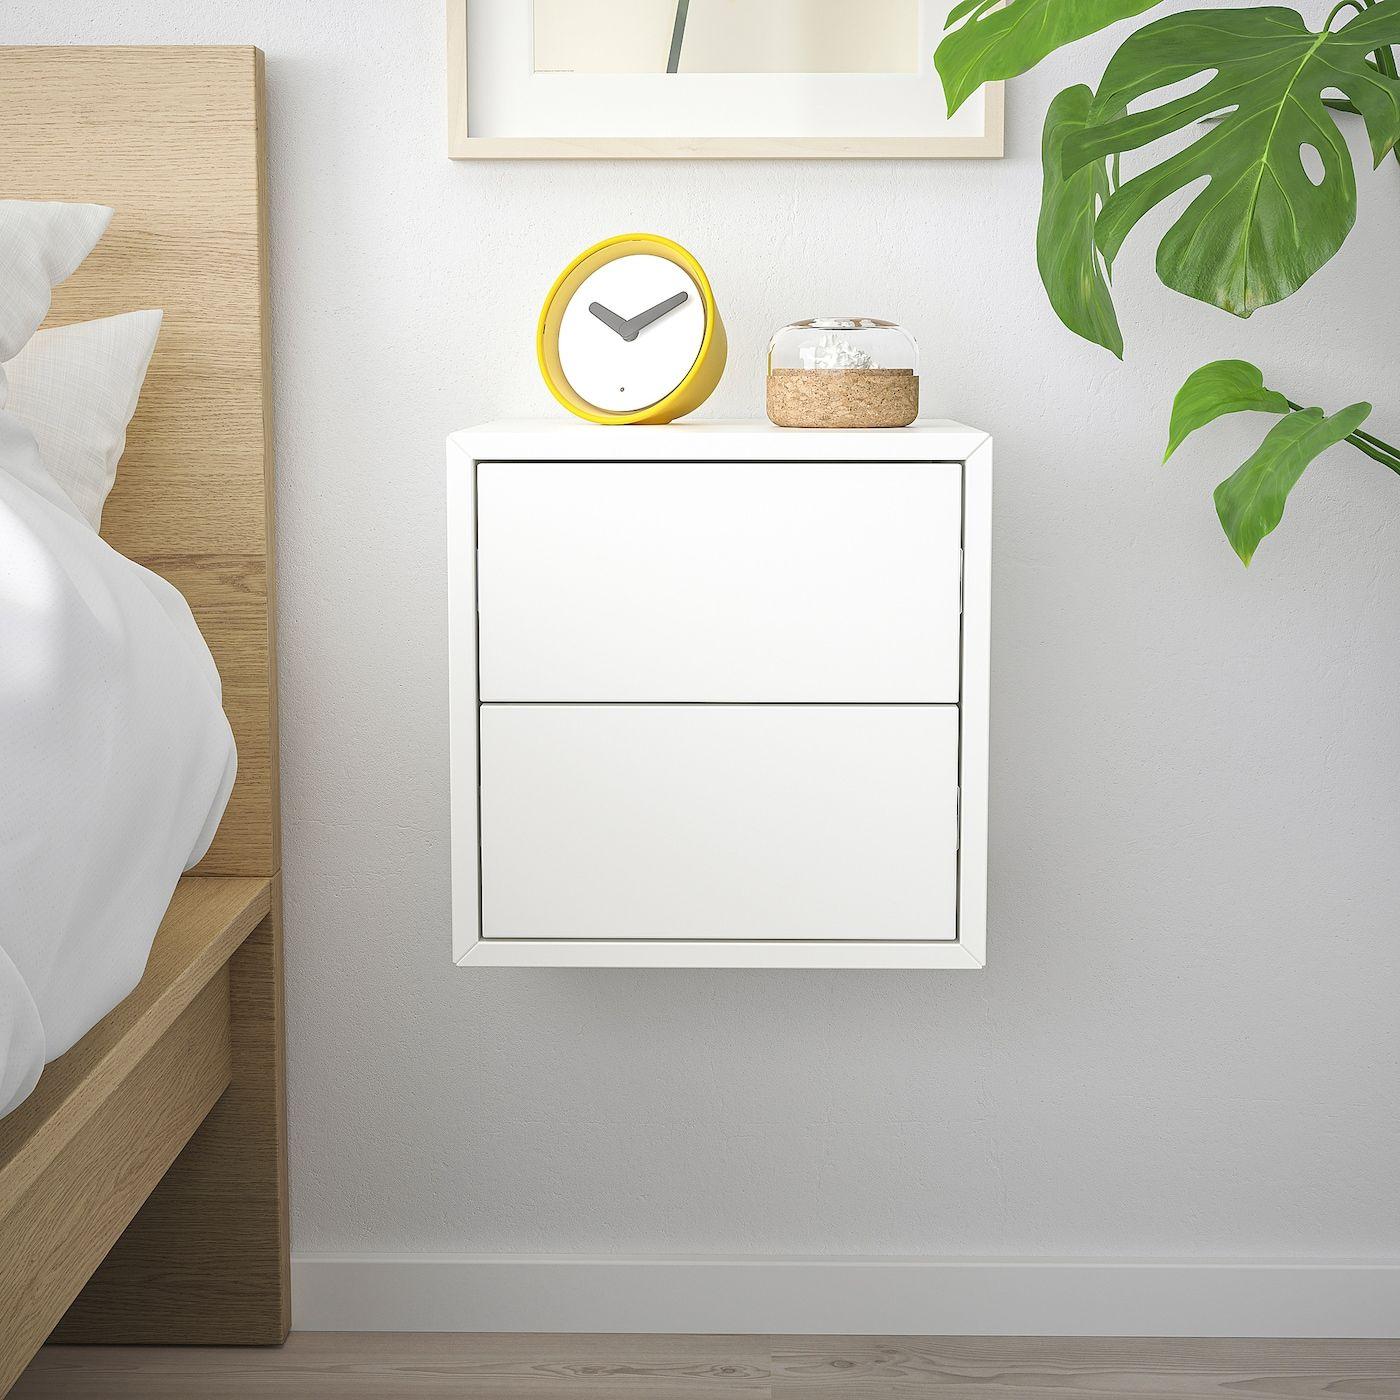 Eket Wandschrank Mit 2 Schubladen Weiss Ikea Osterreich In 2020 Eket Ikea Eket Floating Nightstand Ikea